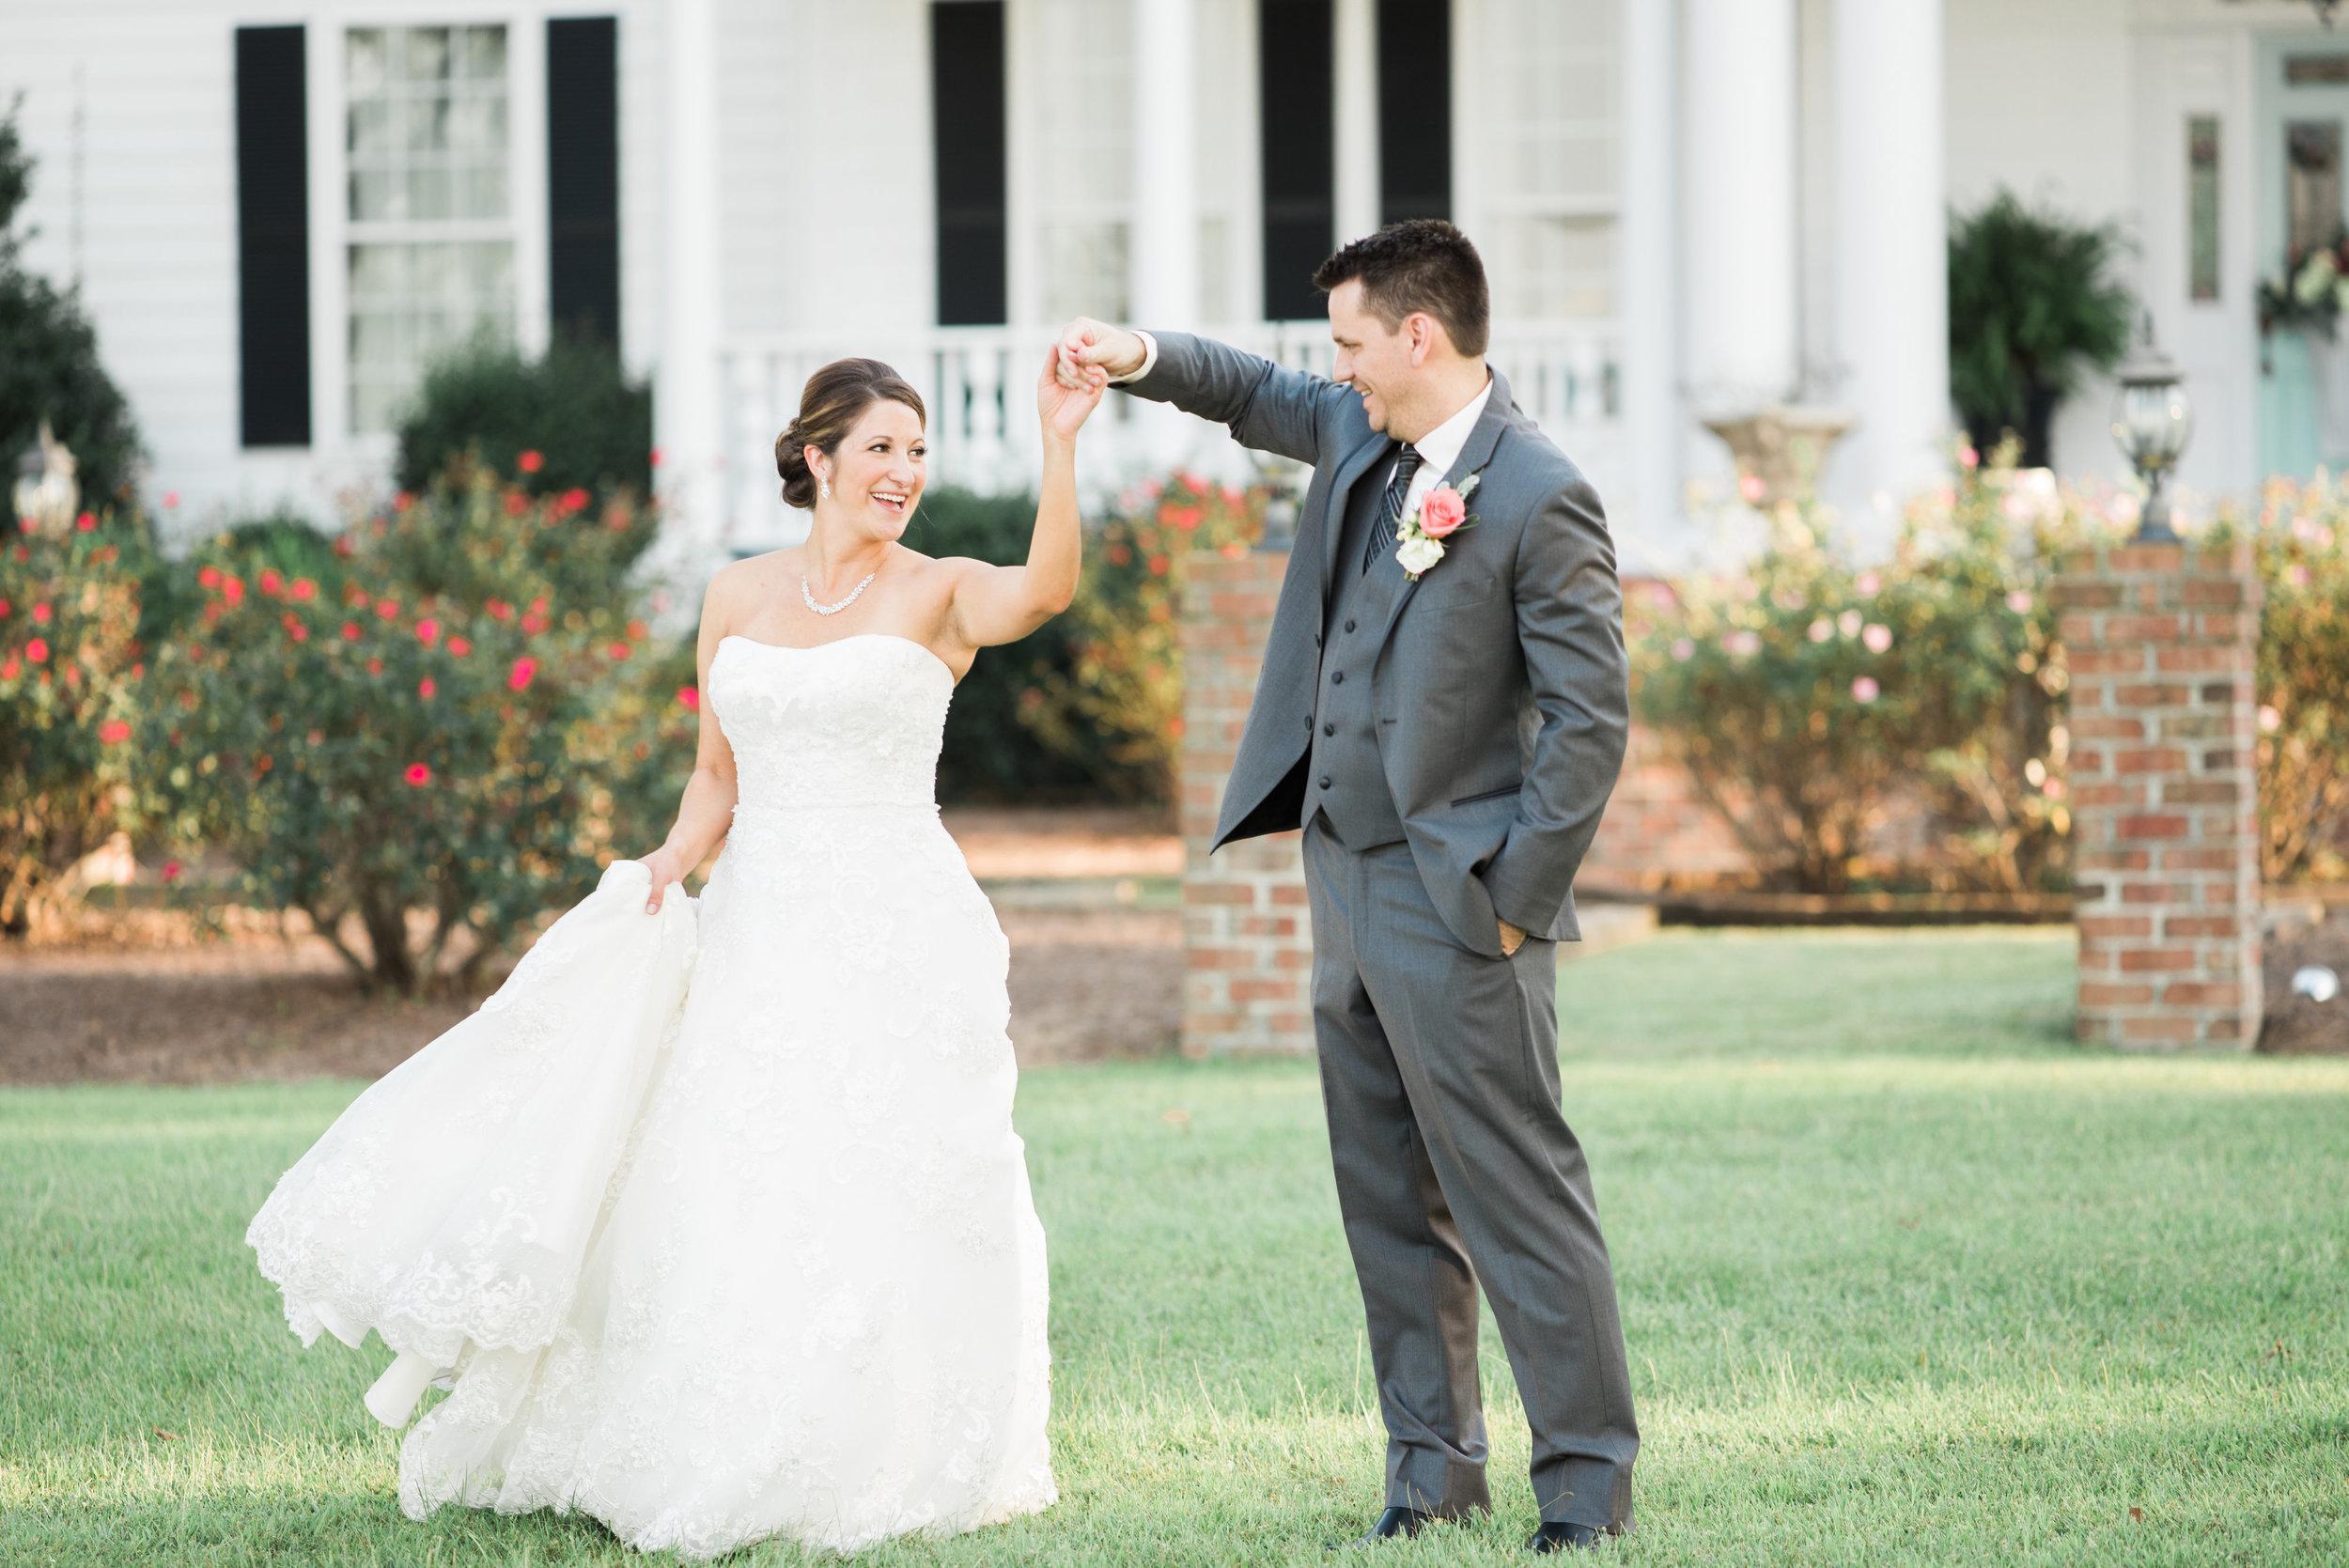 Danielle and Butch s Wedding-Bridal Party Portraits-0129.jpg